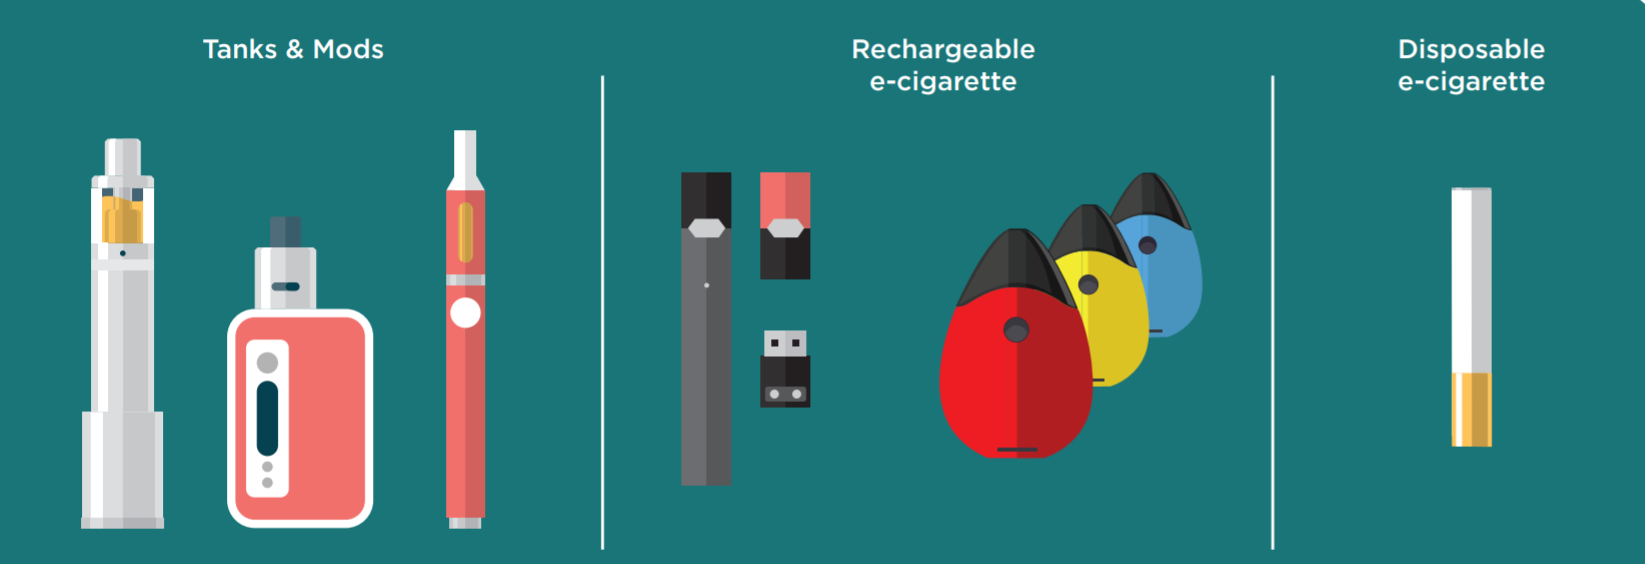 types of e-cigarettes